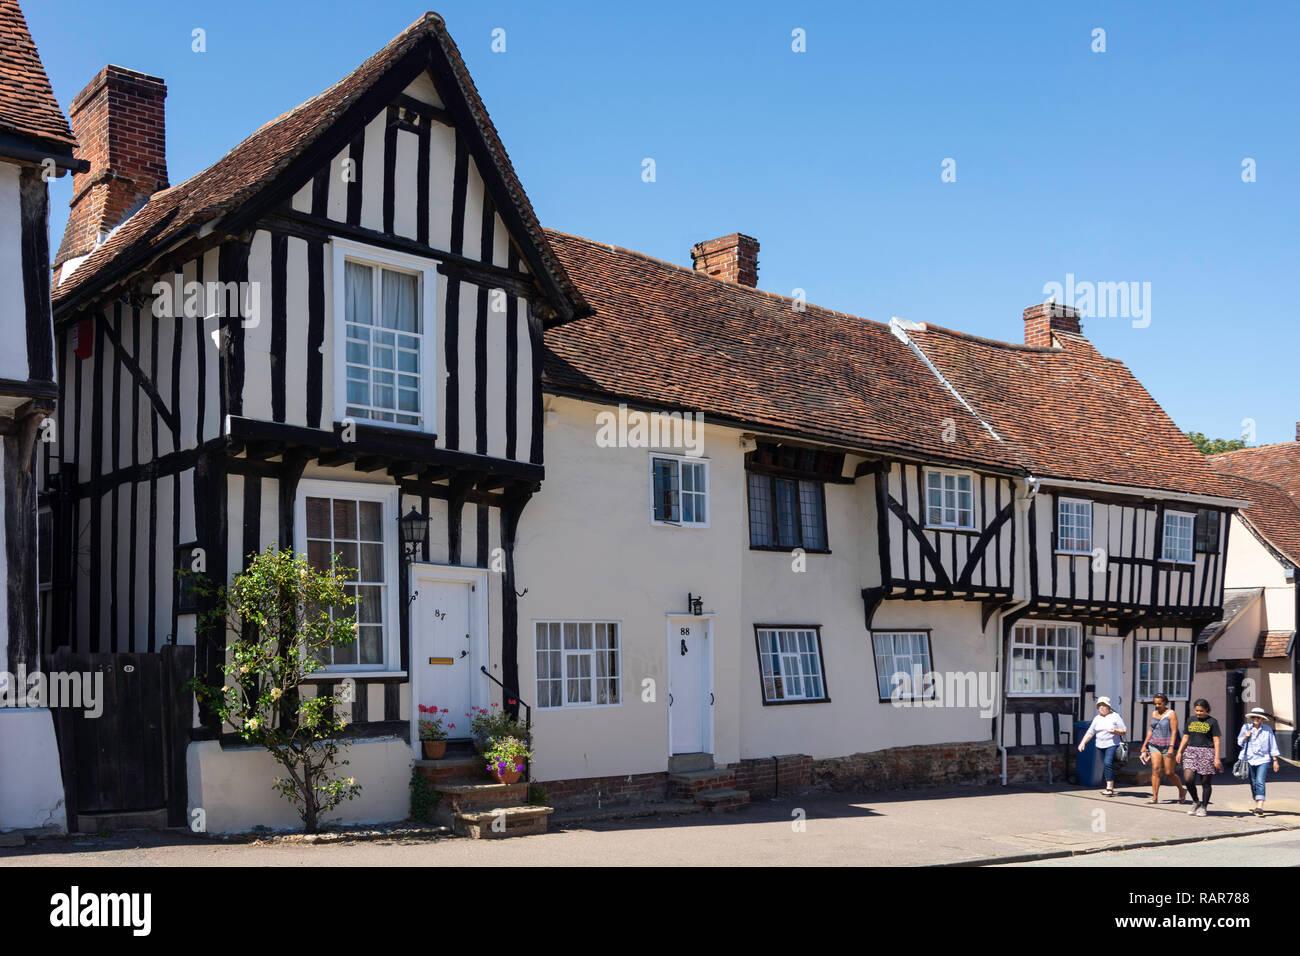 Period houses, Church Street, Lavenham, Suffolk, England, United Kingdom - Stock Image